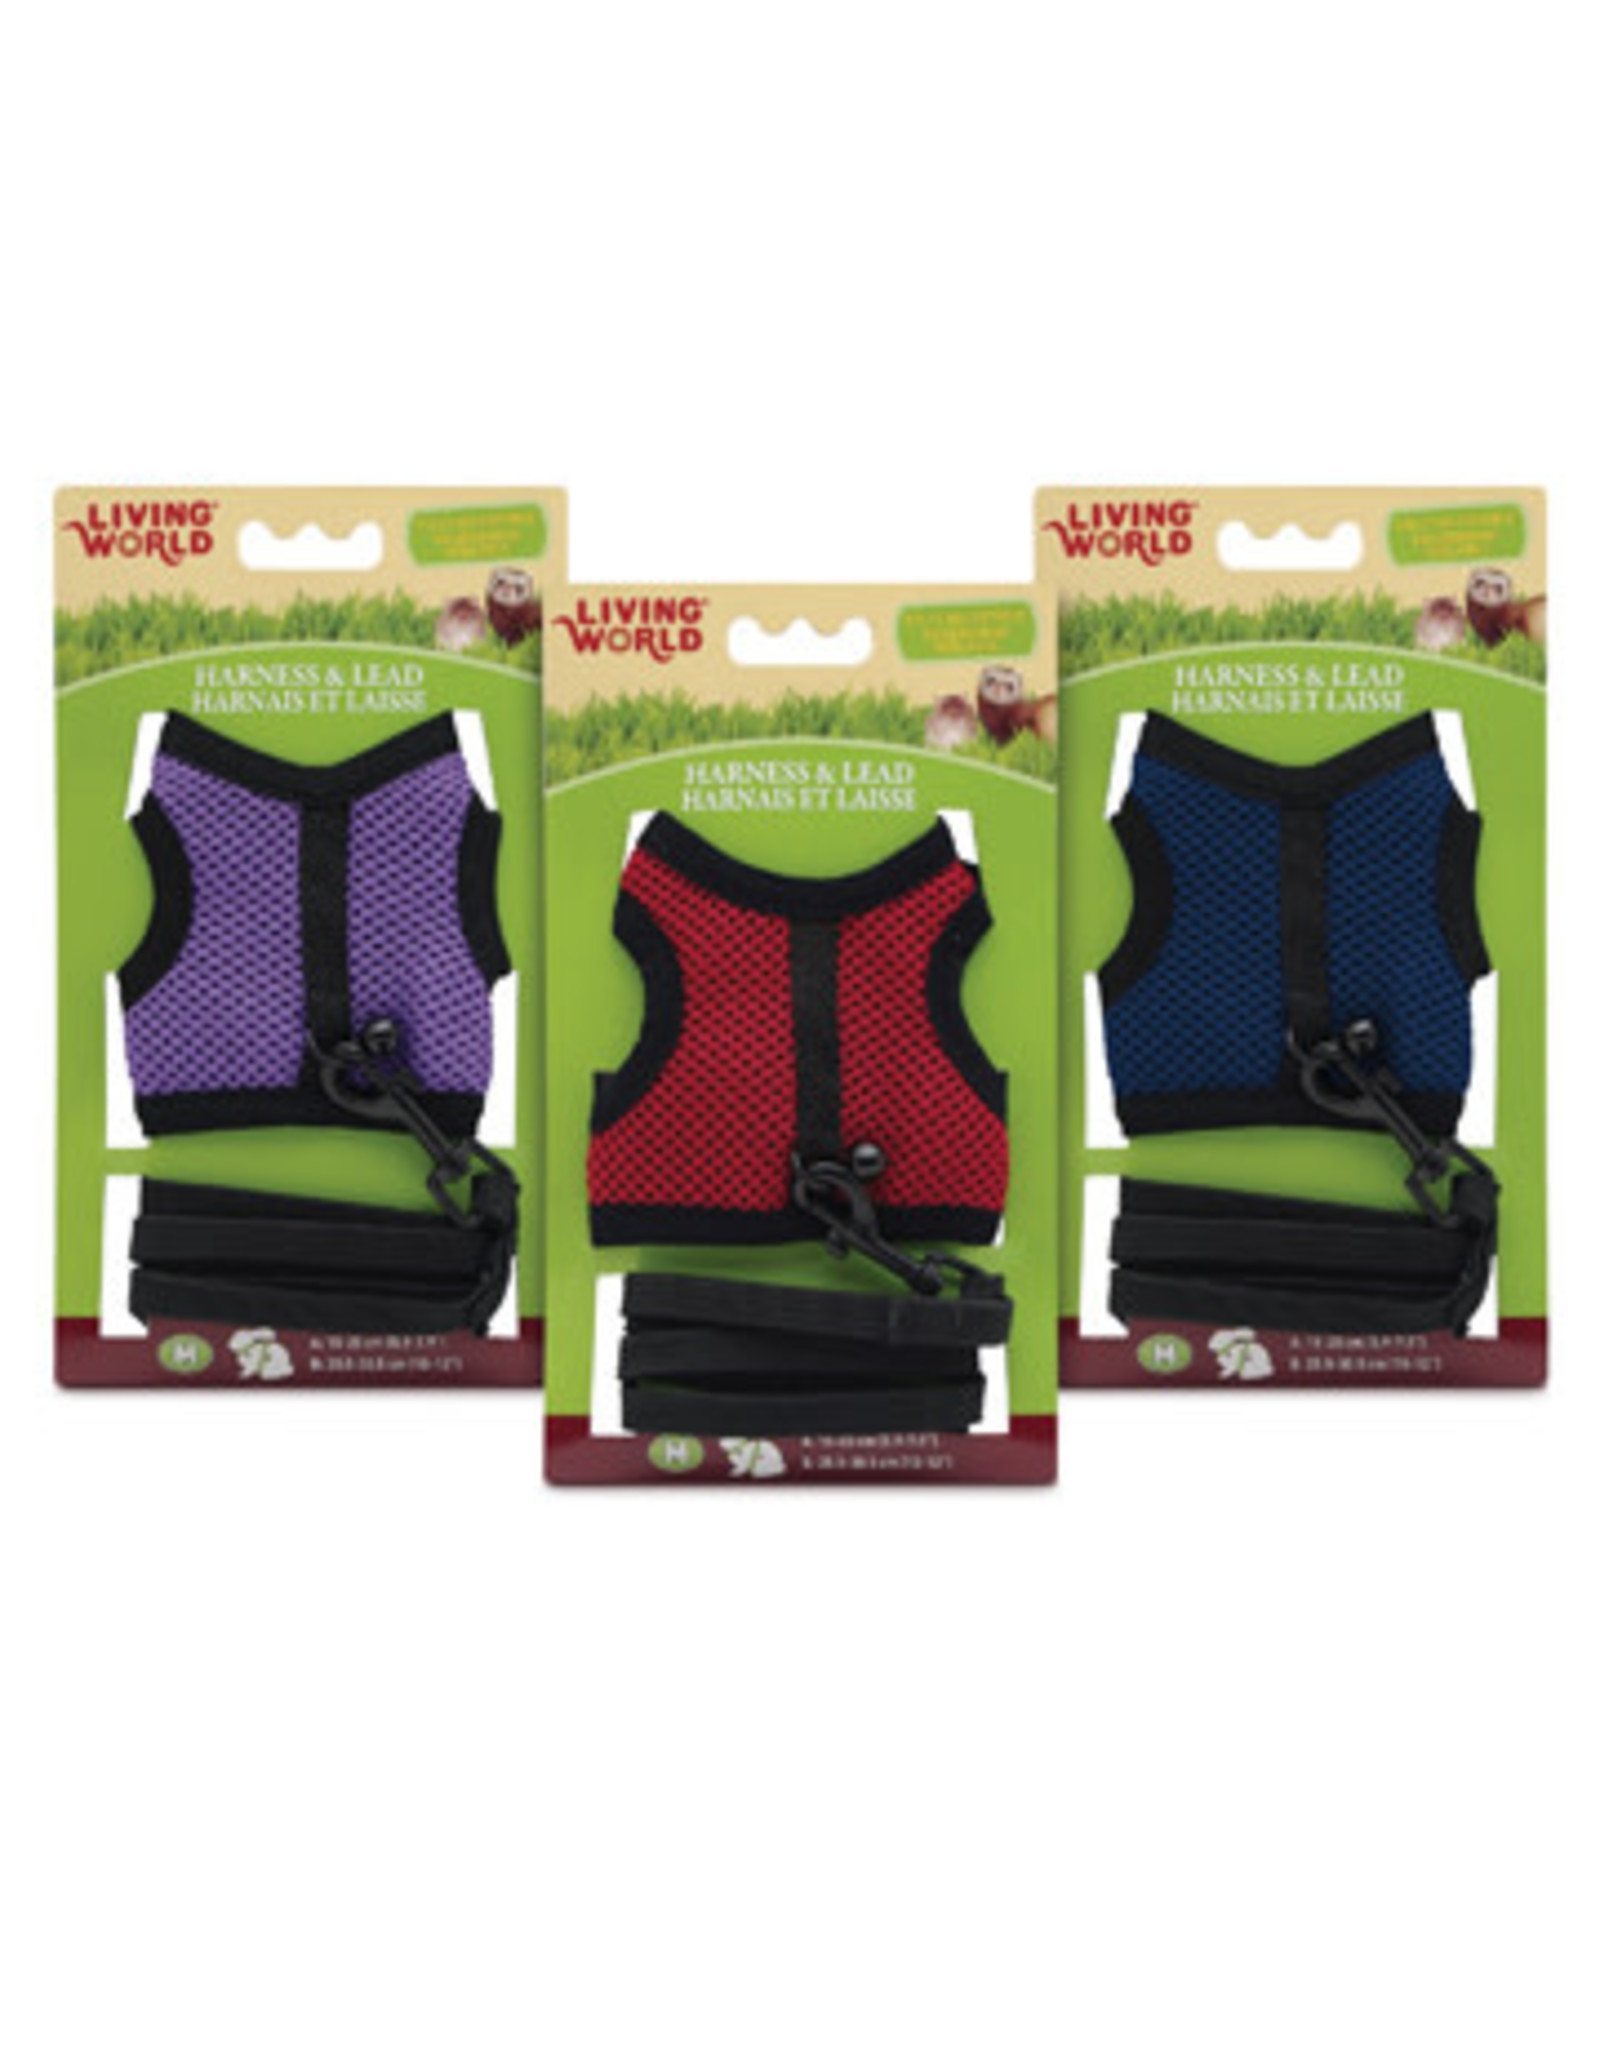 Living World Medium Harness and Lead Set - Assorted Colors - Medium